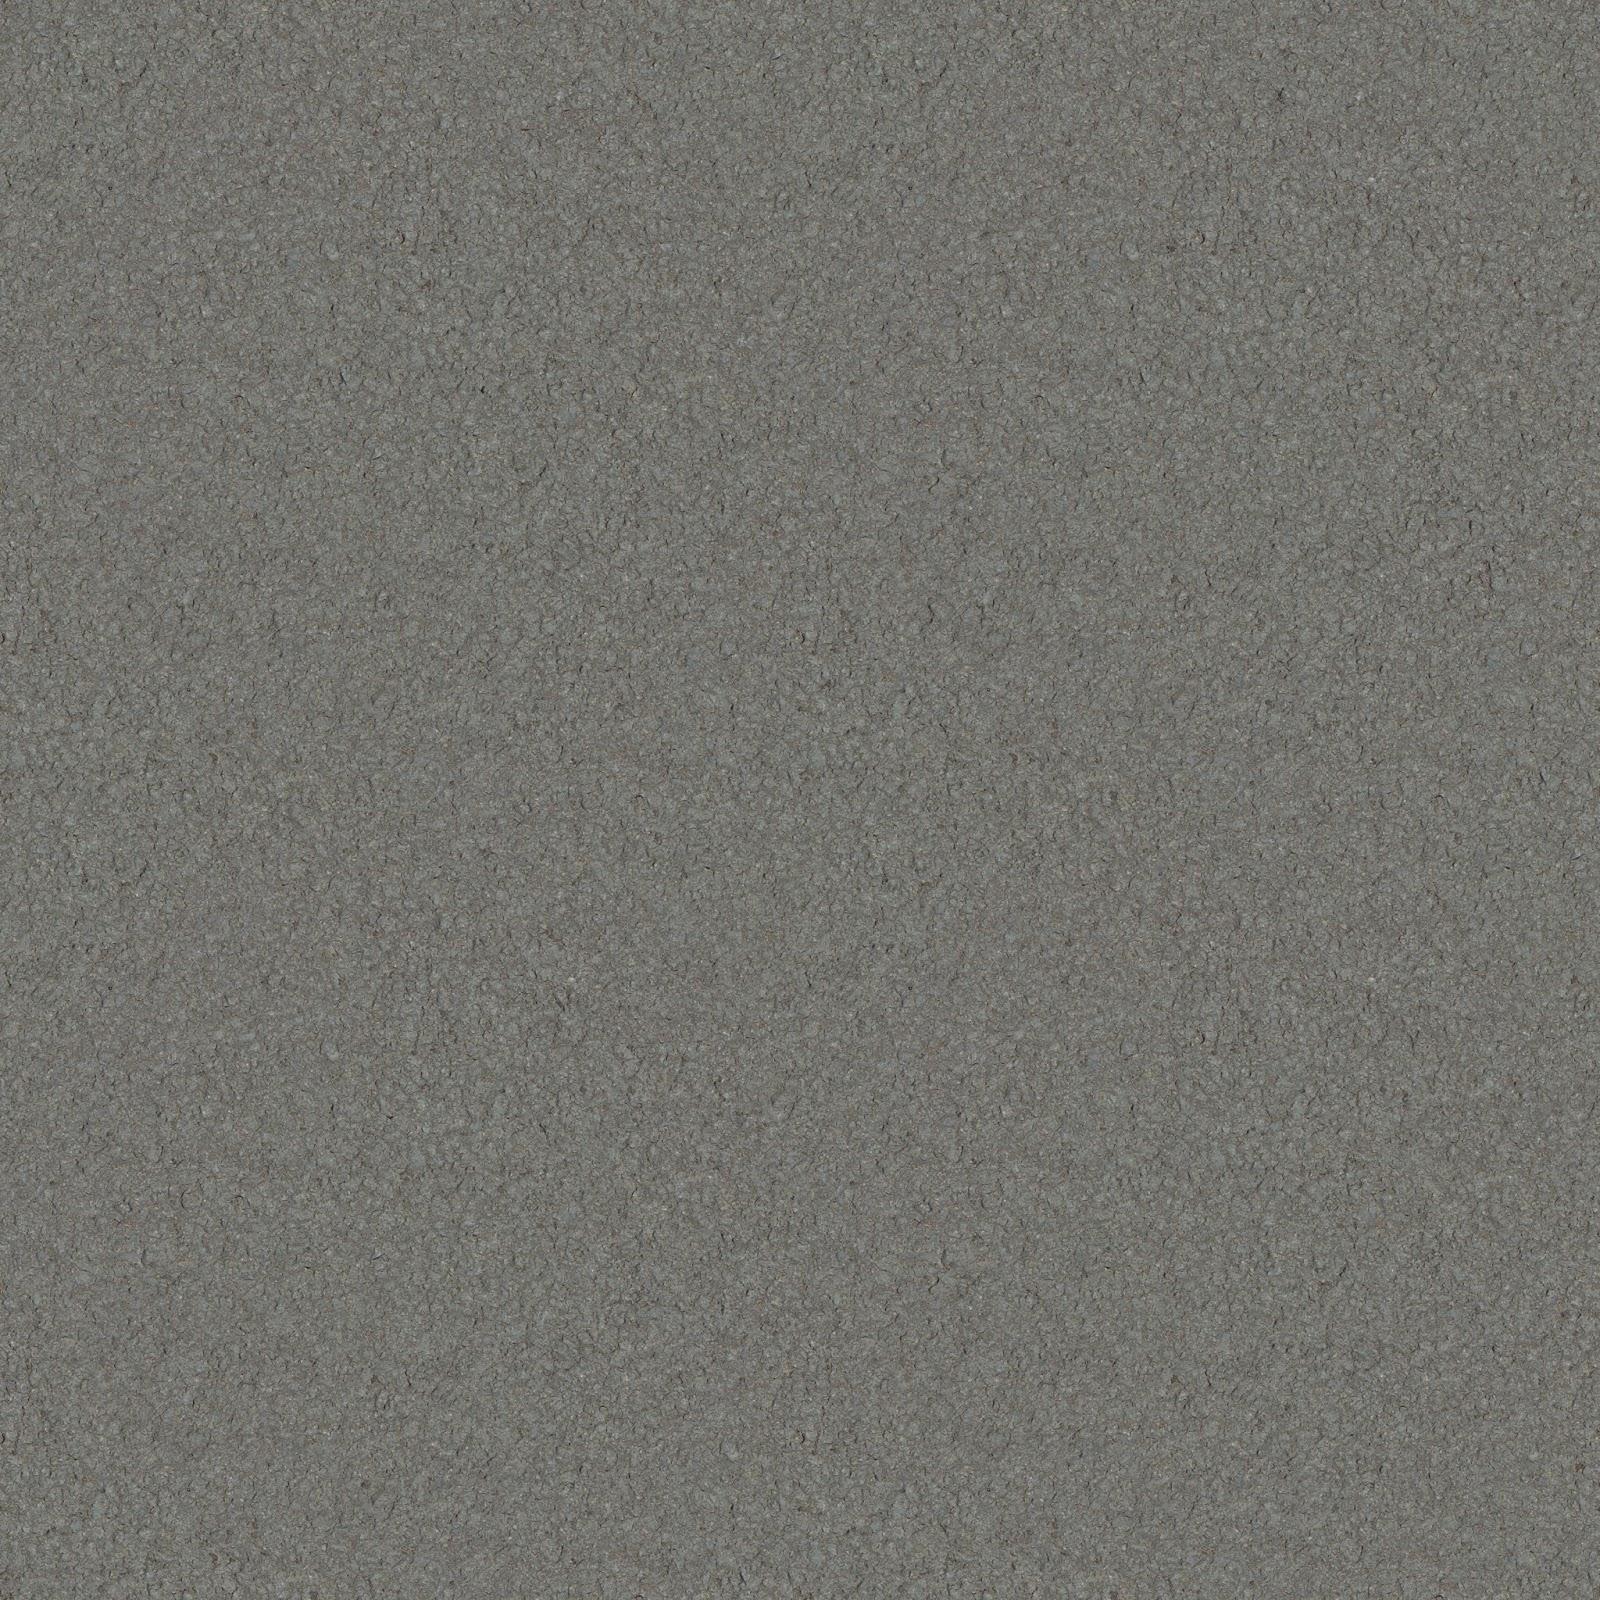 High Resolution Seamless Textures November 2015